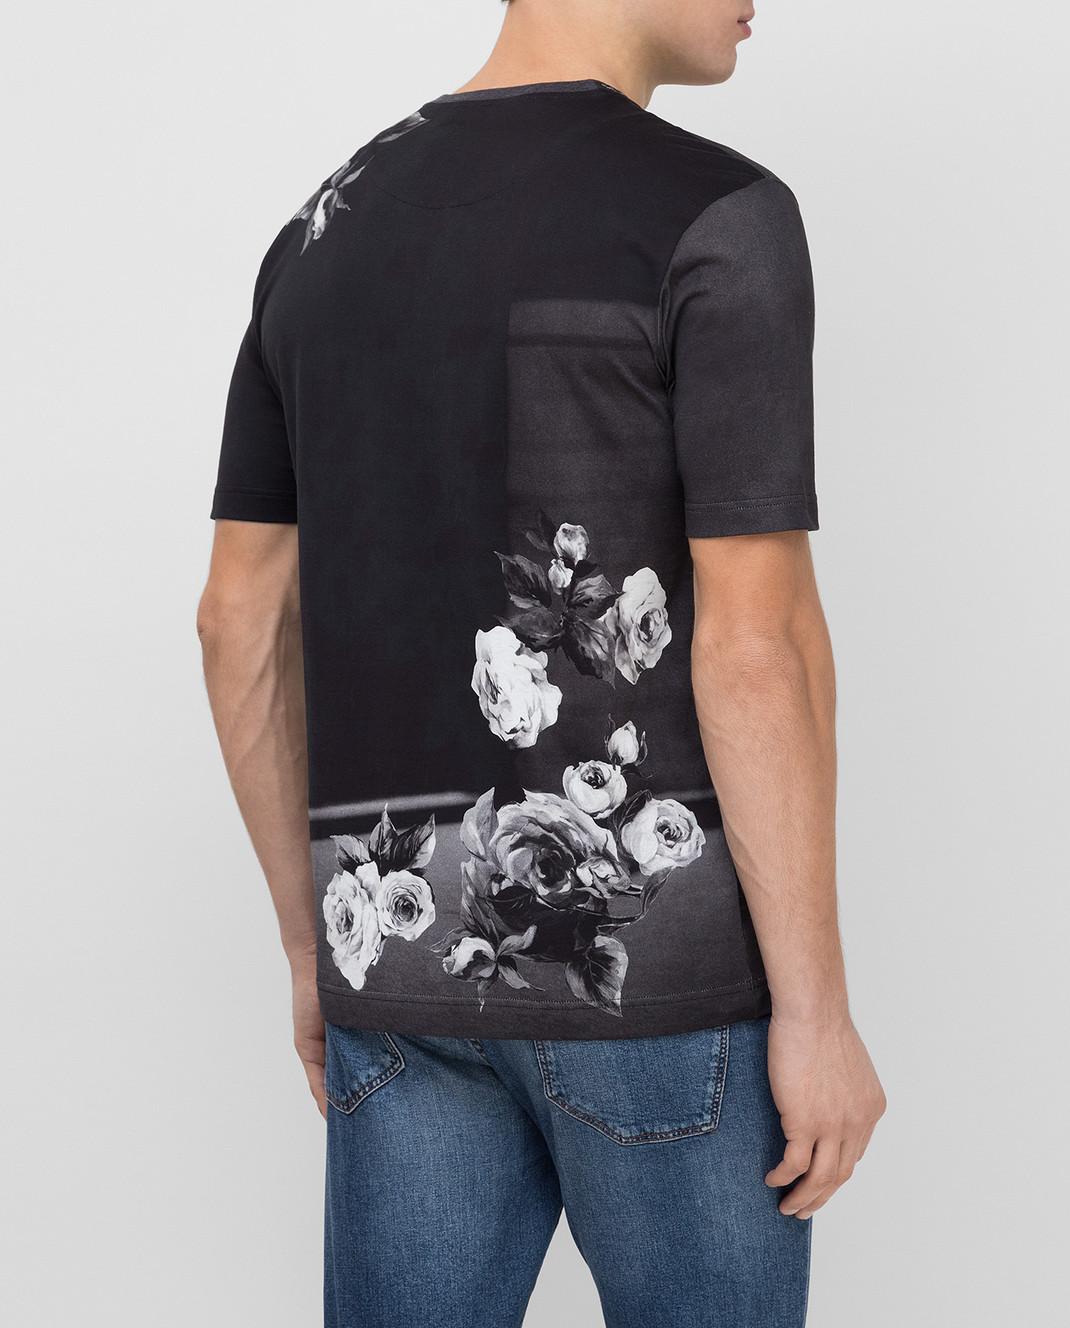 Dolce&Gabbana Черная футболка G8GW5TFP718 изображение 4